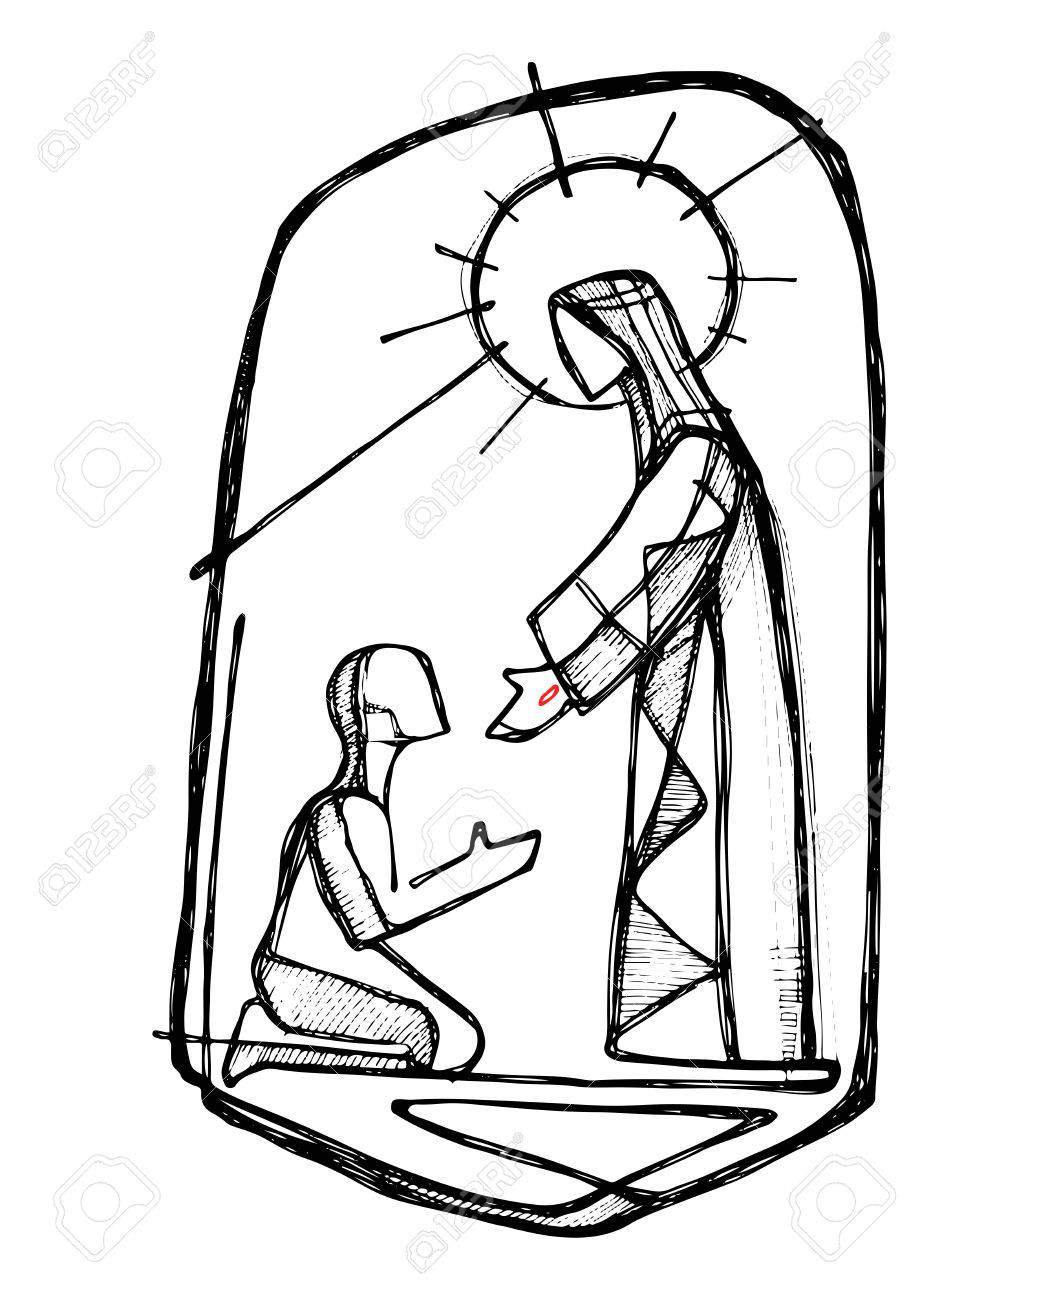 98 Jesus Healing Stock Vector Illustration And Royalty Free Jesus.